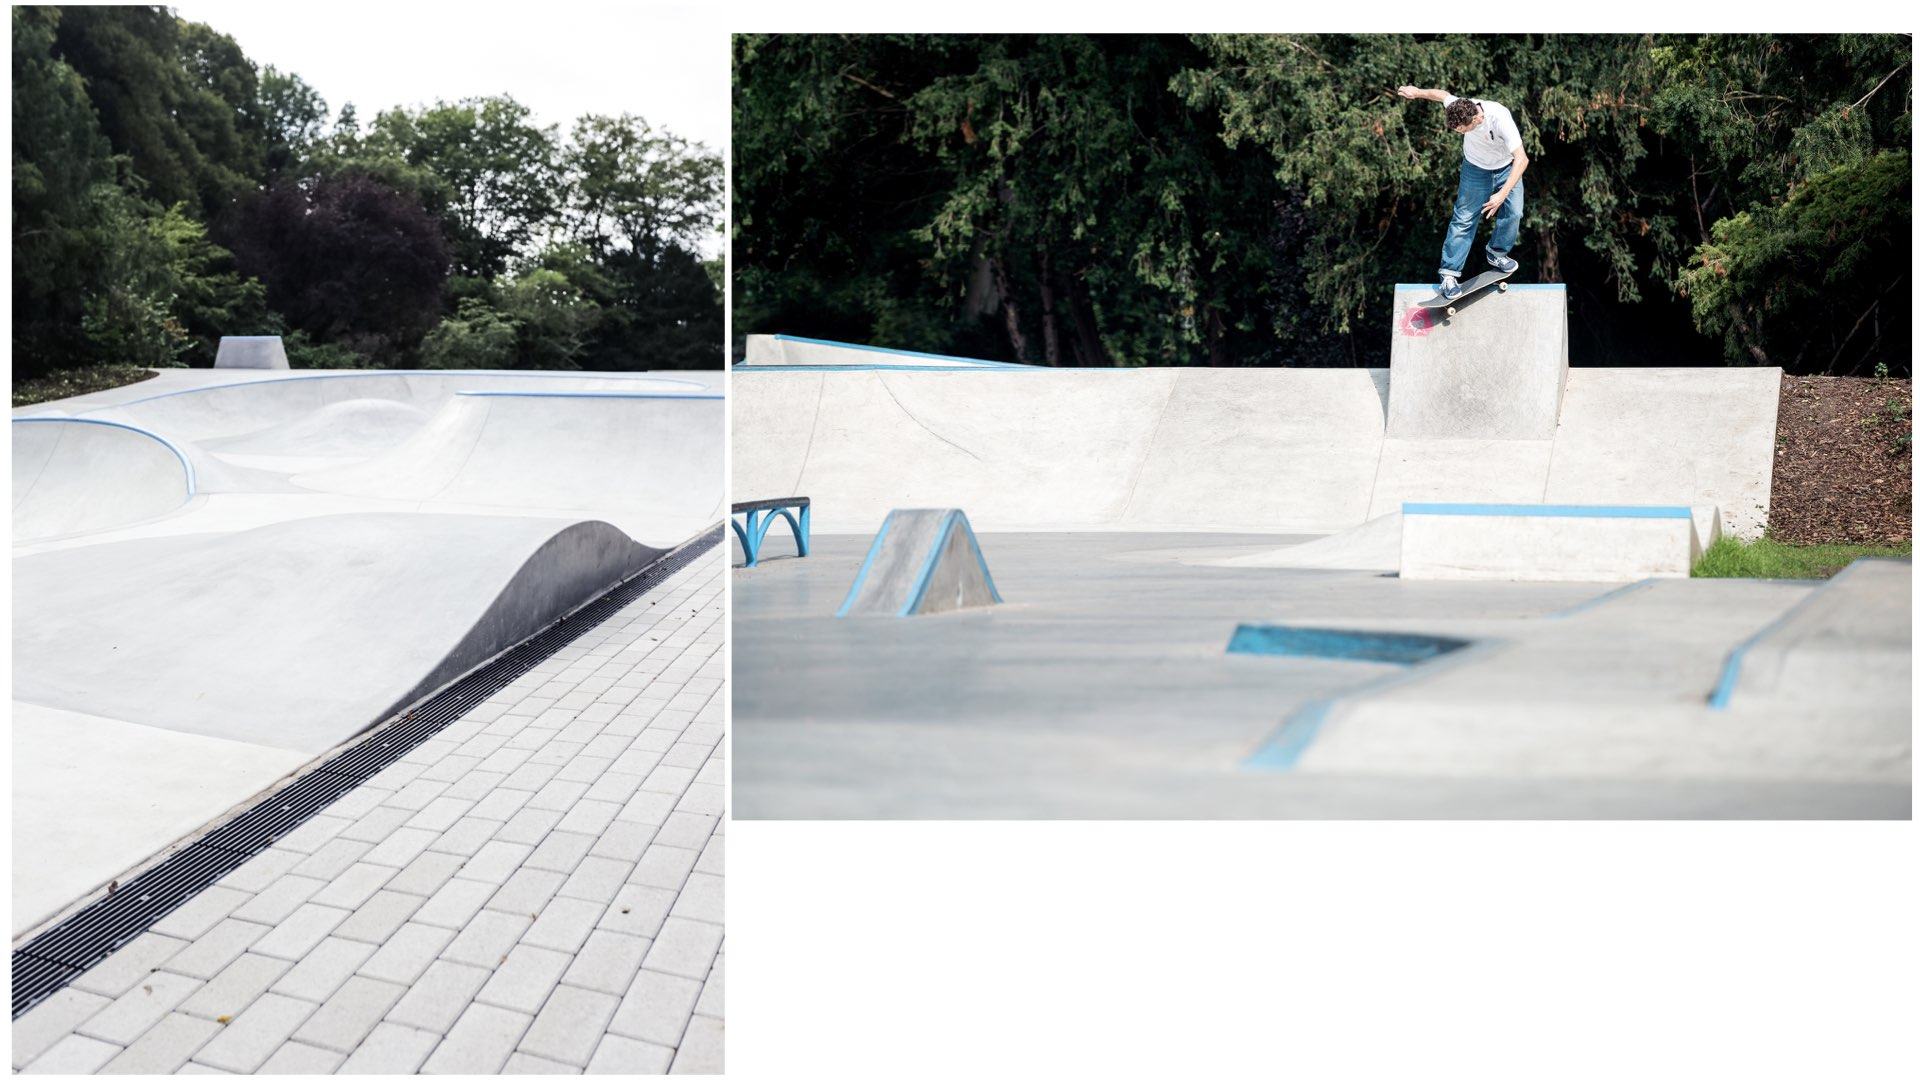 landskate_skatepark_planung_veith_kilberth